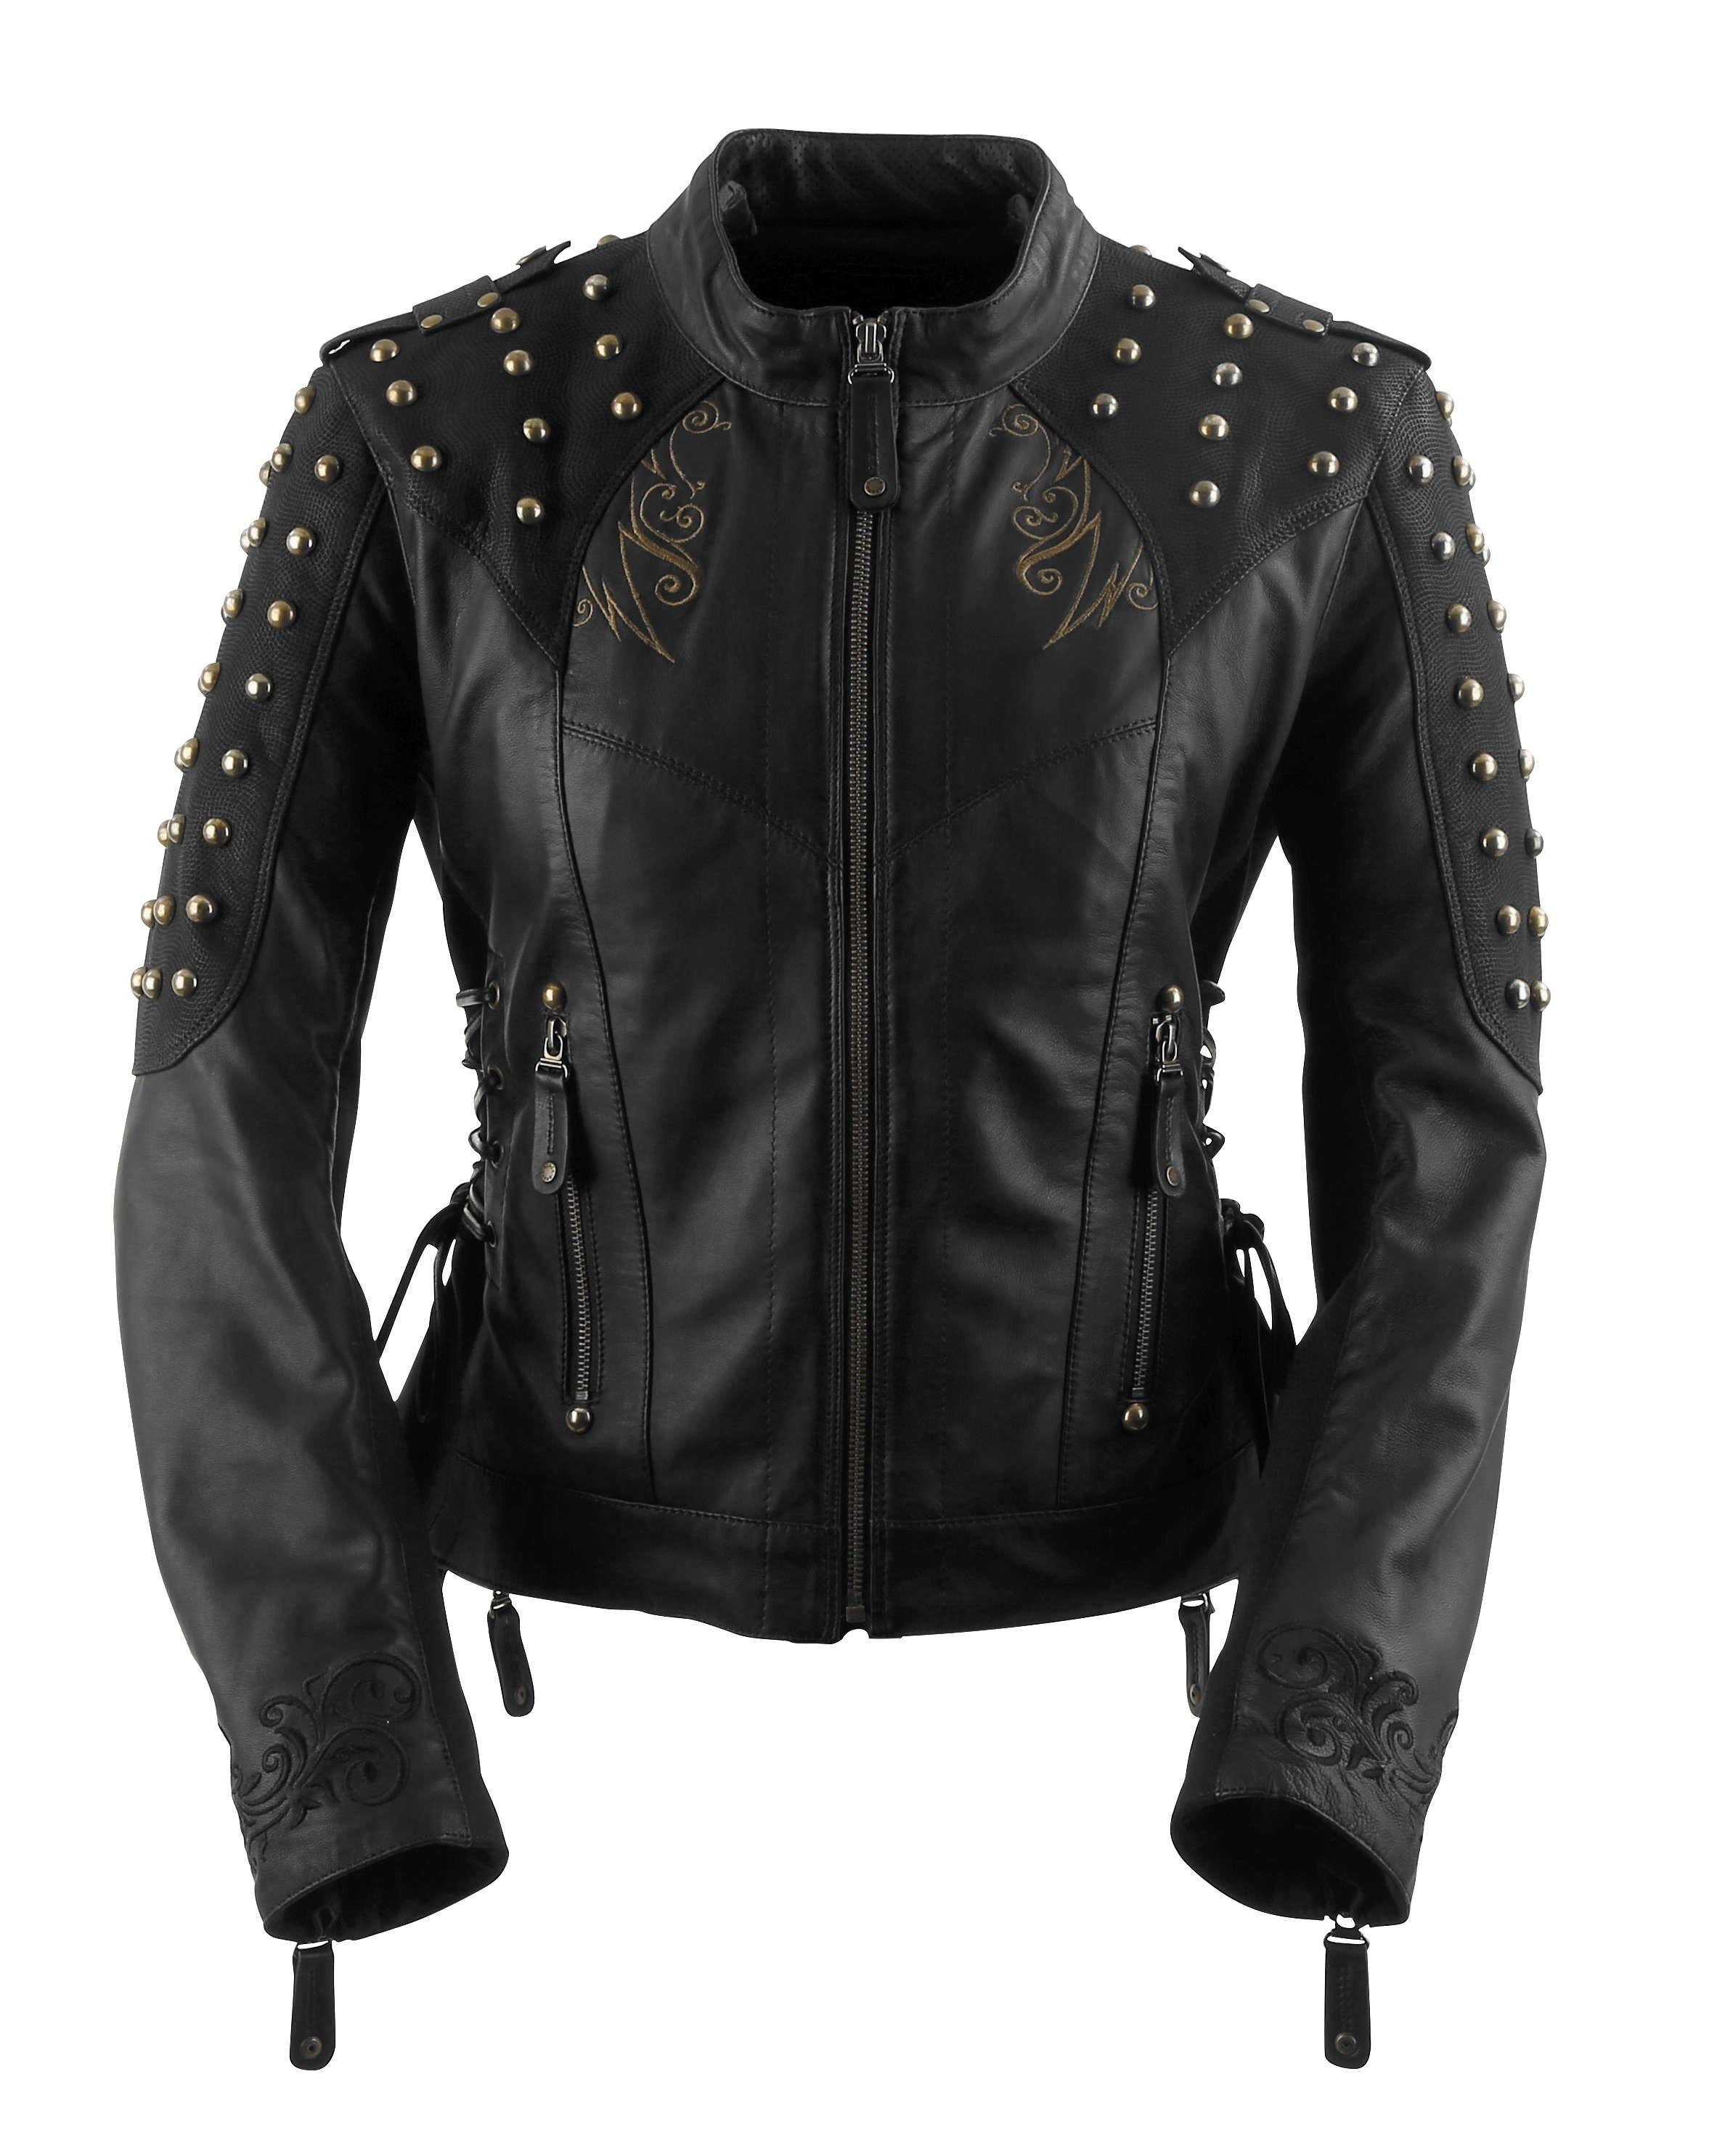 Black Brand Mantra Women's Jacket Motorcycle jacket women